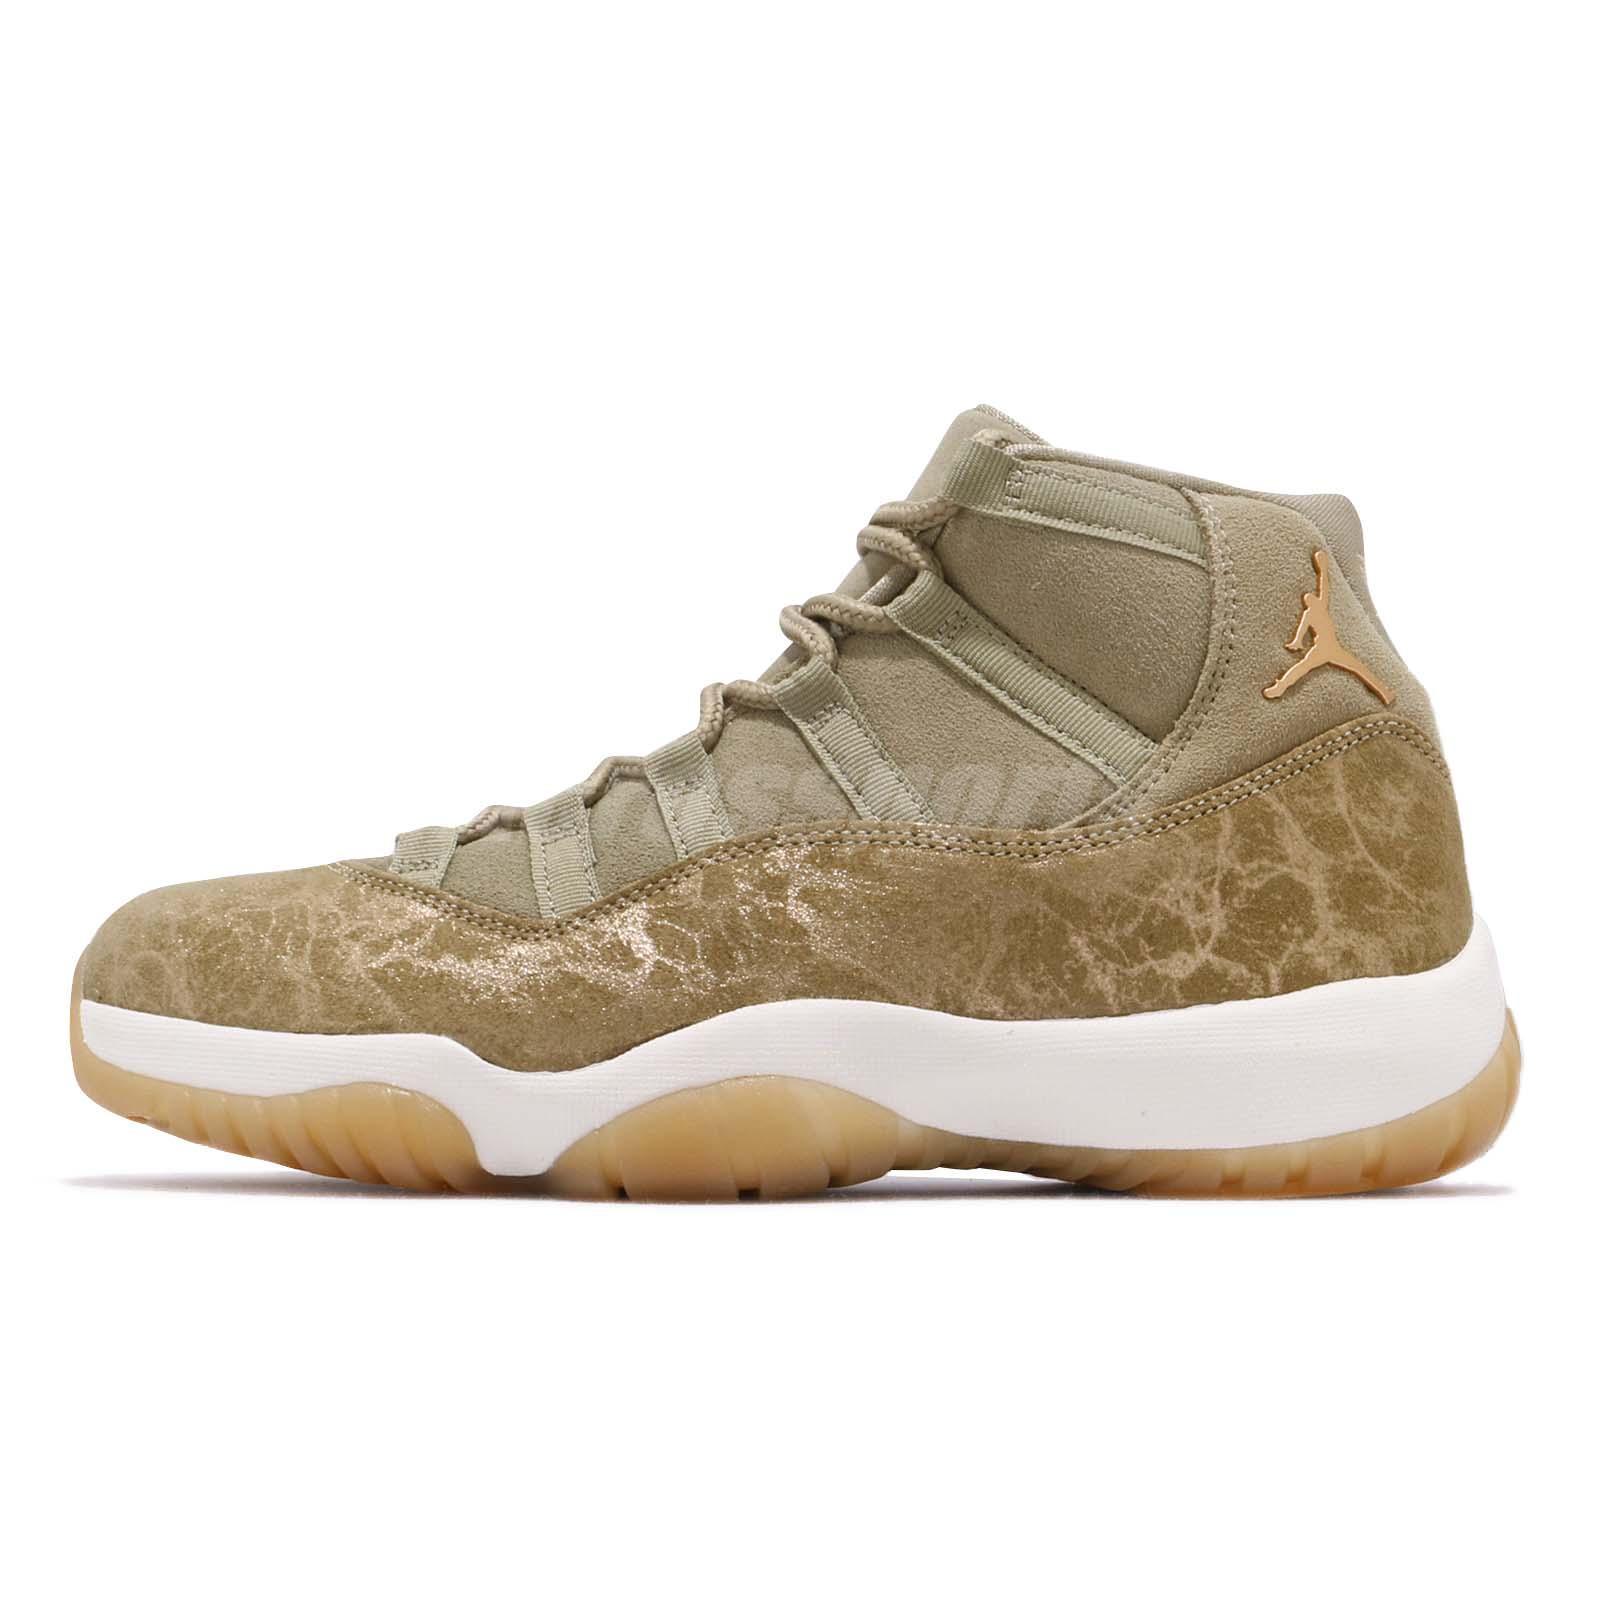 8943868a56 Nike Wmns Air Jordan 11 Retro XI Neutral Olive Womens Sneakers AJ11 AR0715- 200